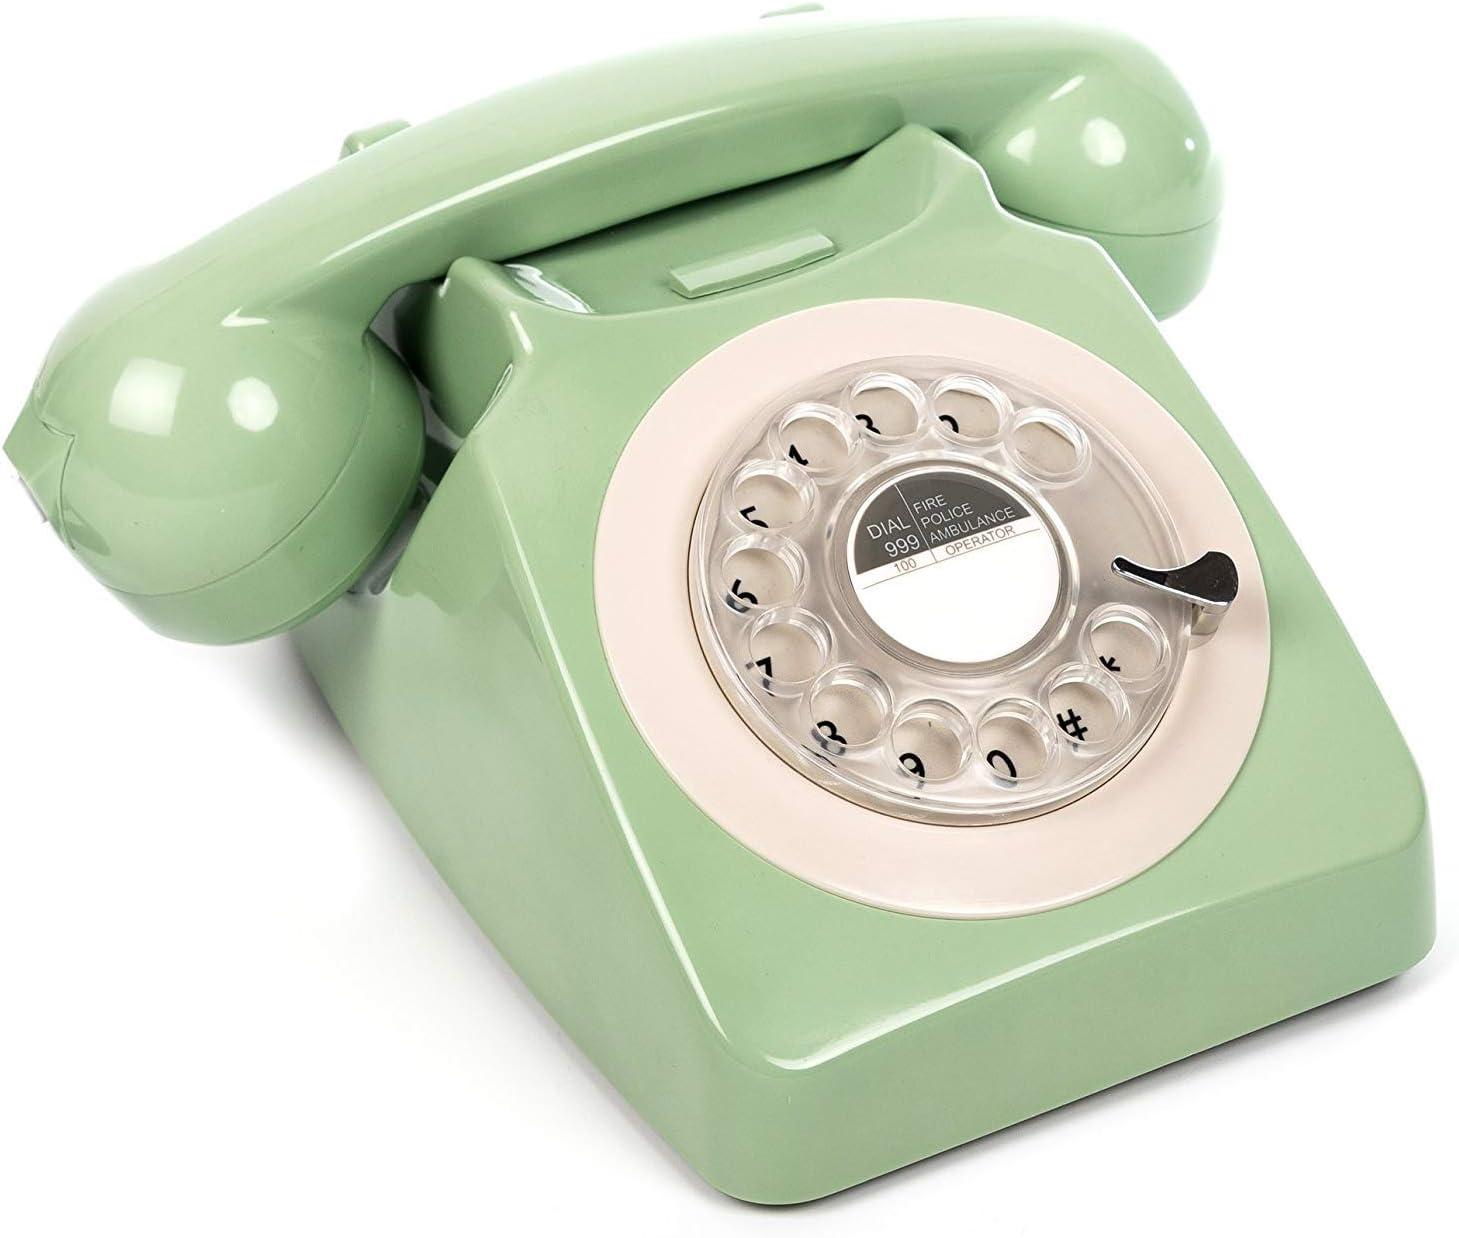 Gpo 746rotarygreen Retro Telefon Mit Wählscheibe Im Elektronik